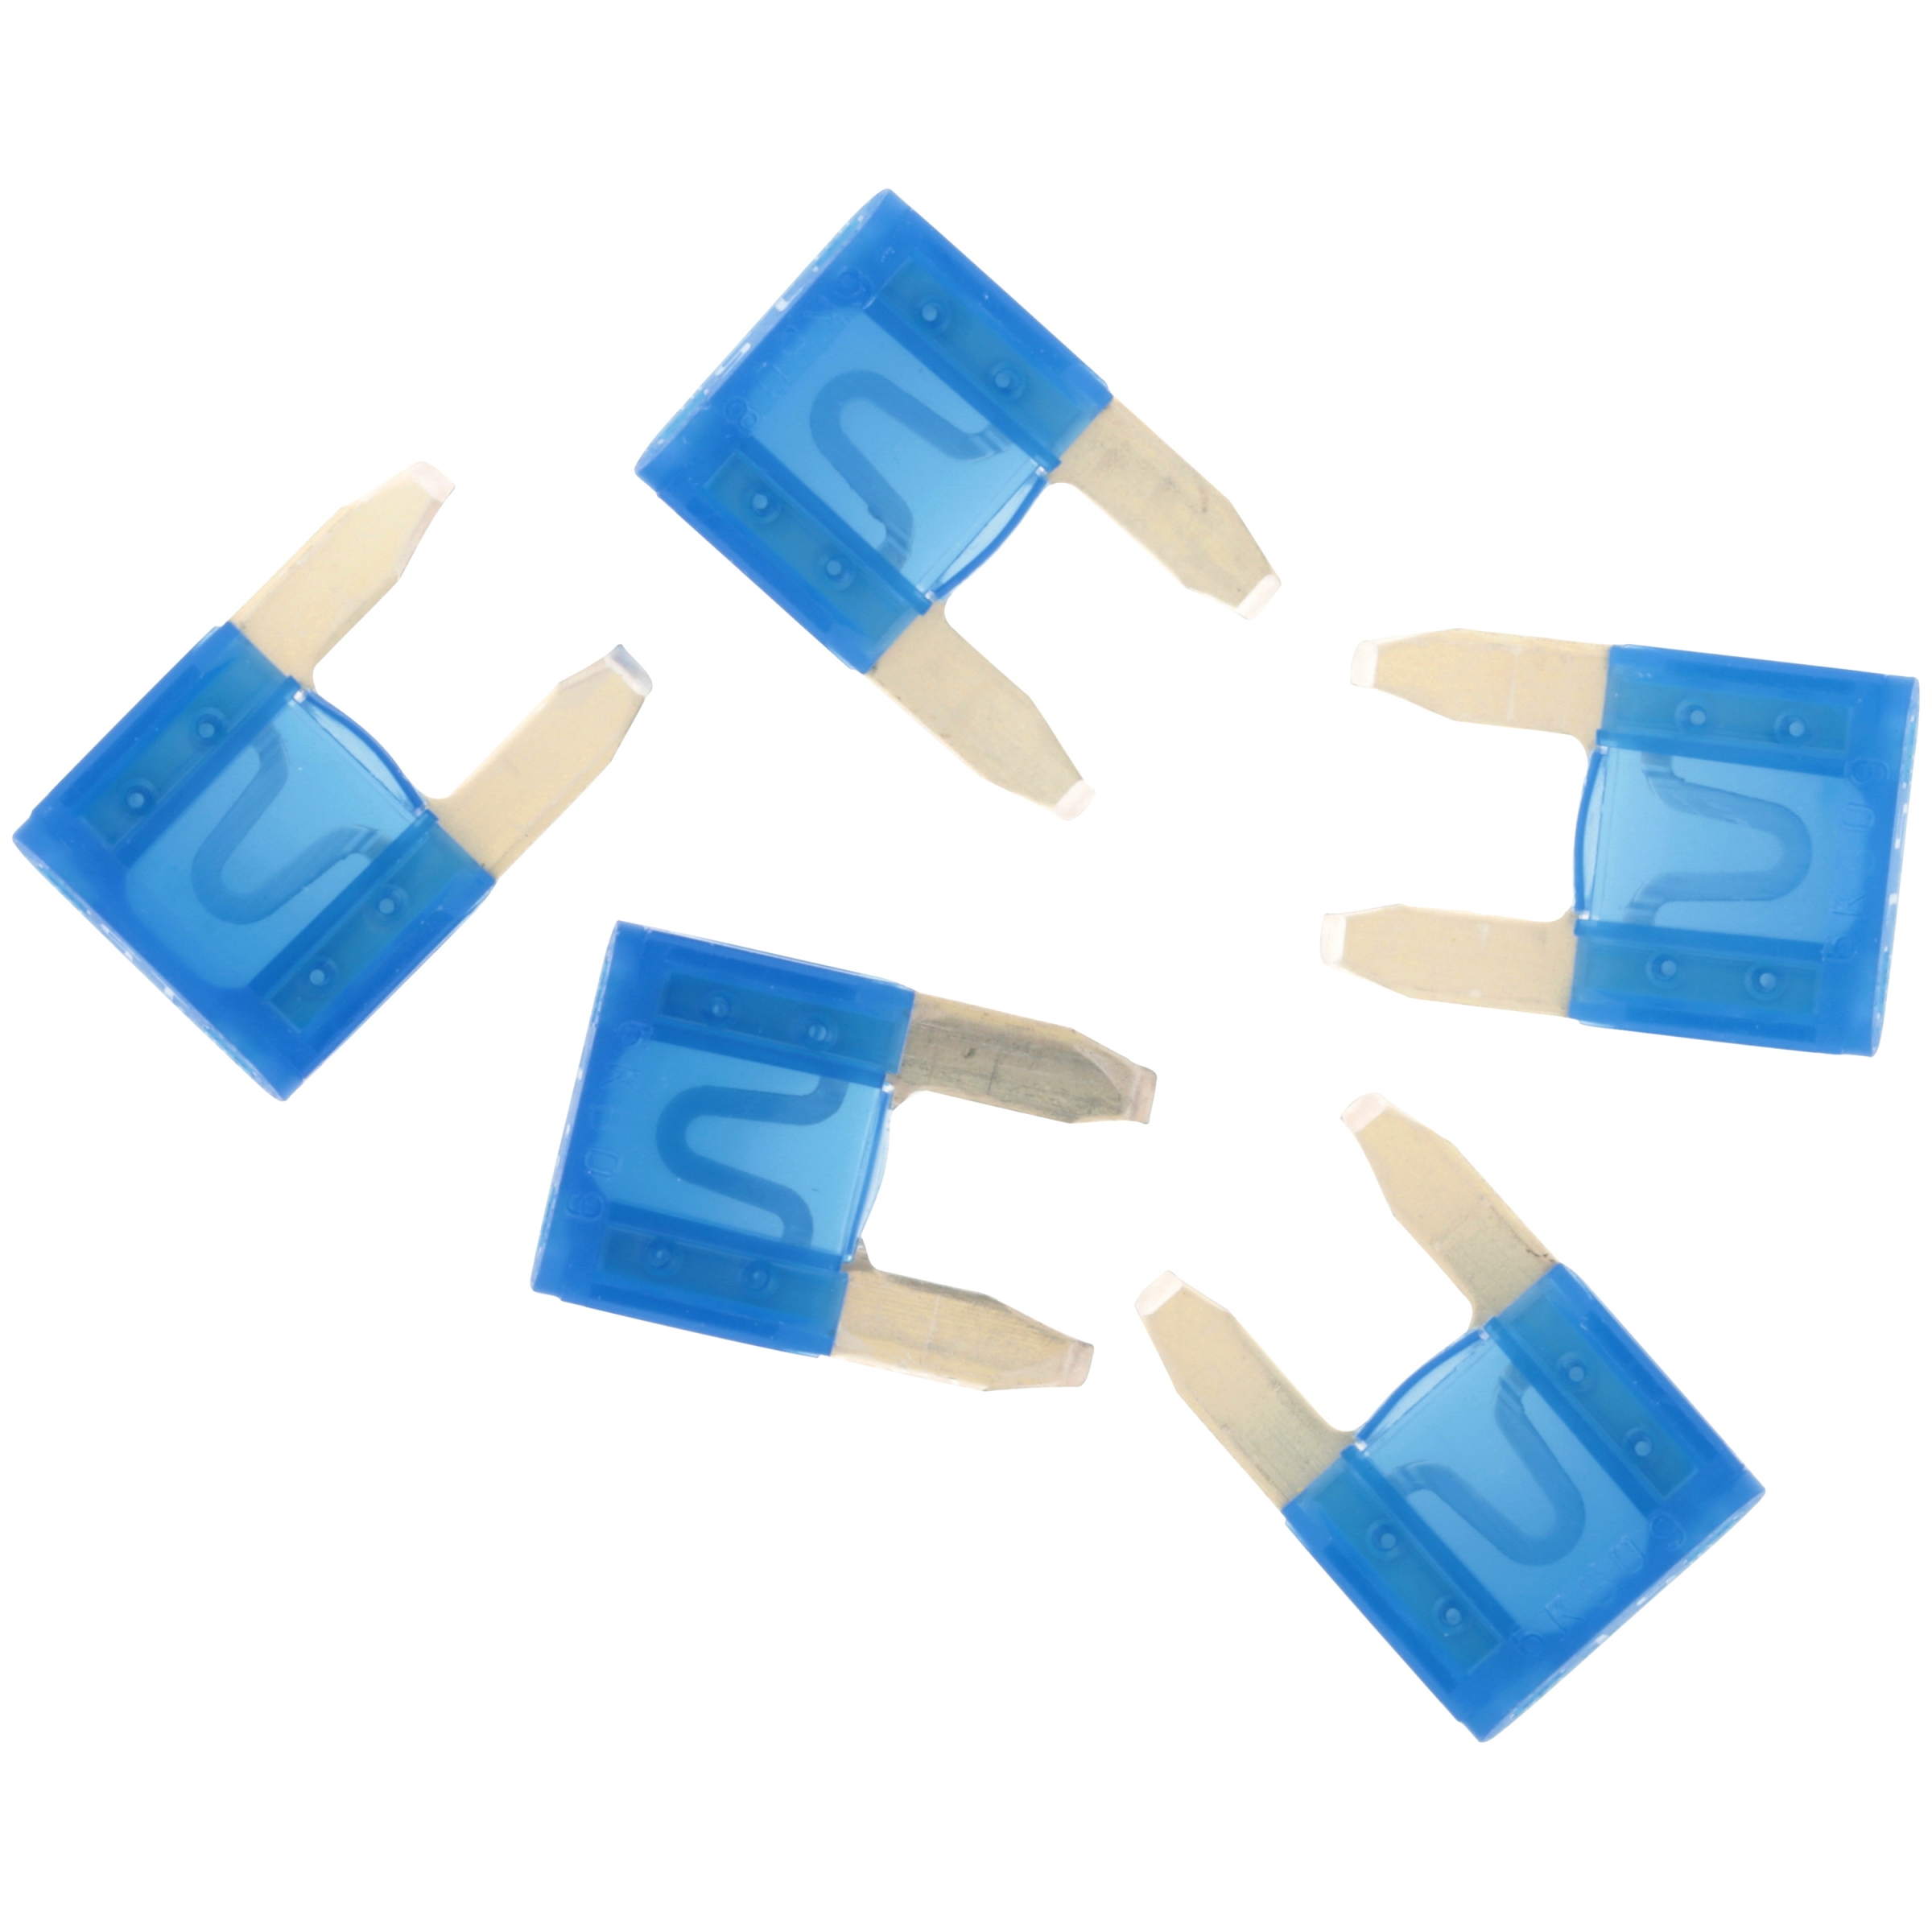 Cooper Bussman™ 15A Mini Fuses 5 ct Pack